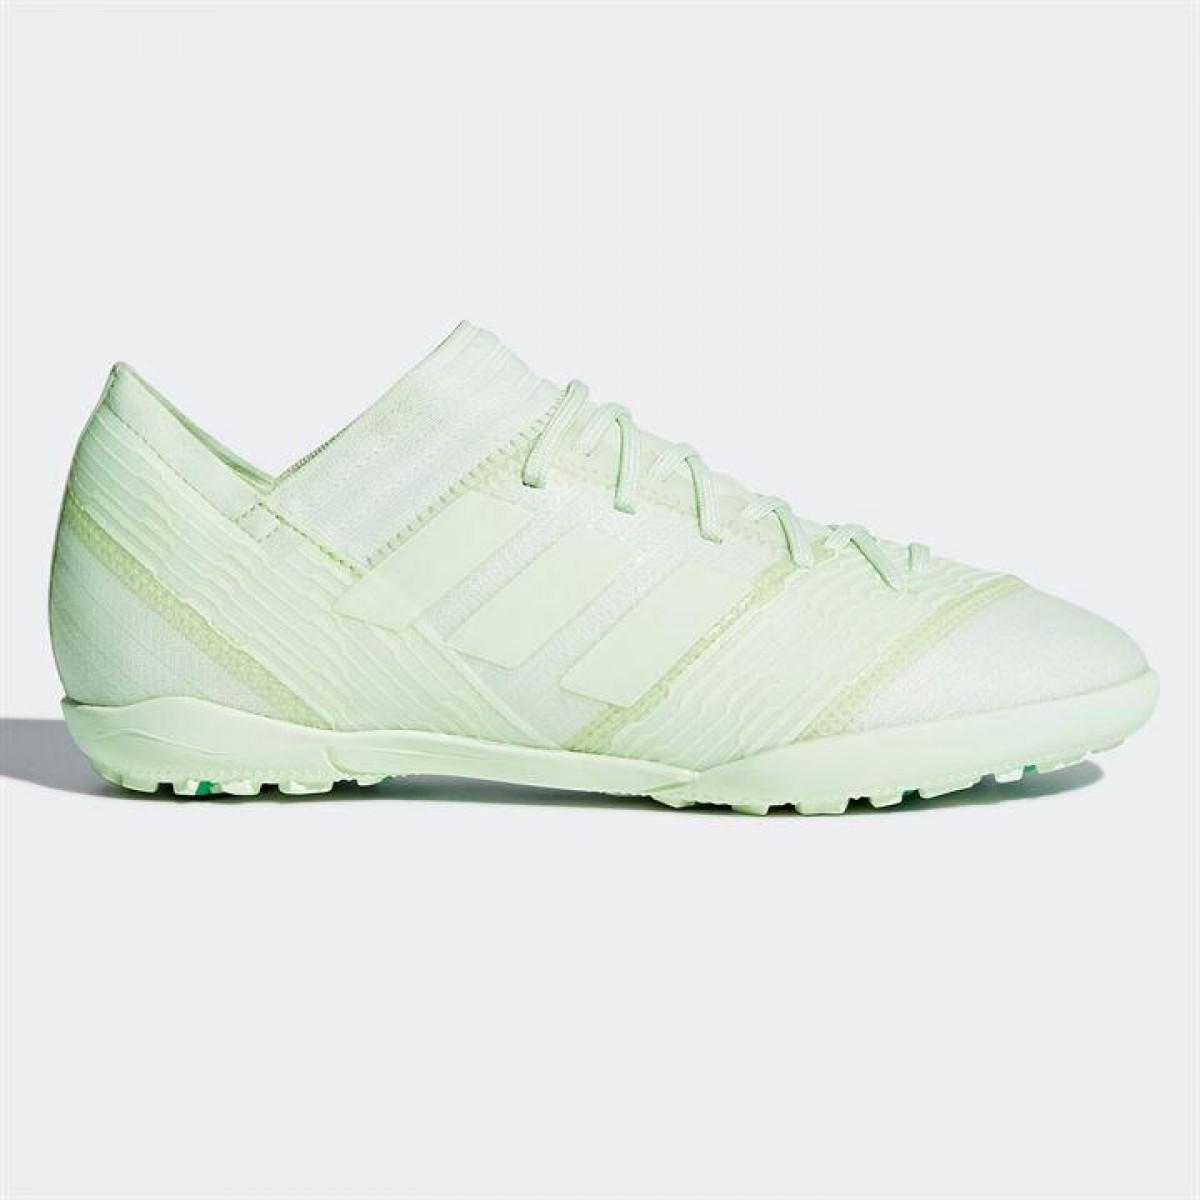 Кроссовки Adidas Nemeziz Tango 17.3 Childrens Astro Turf Trainers  AeroGreen Green - Оригинал 674af8ebb938b